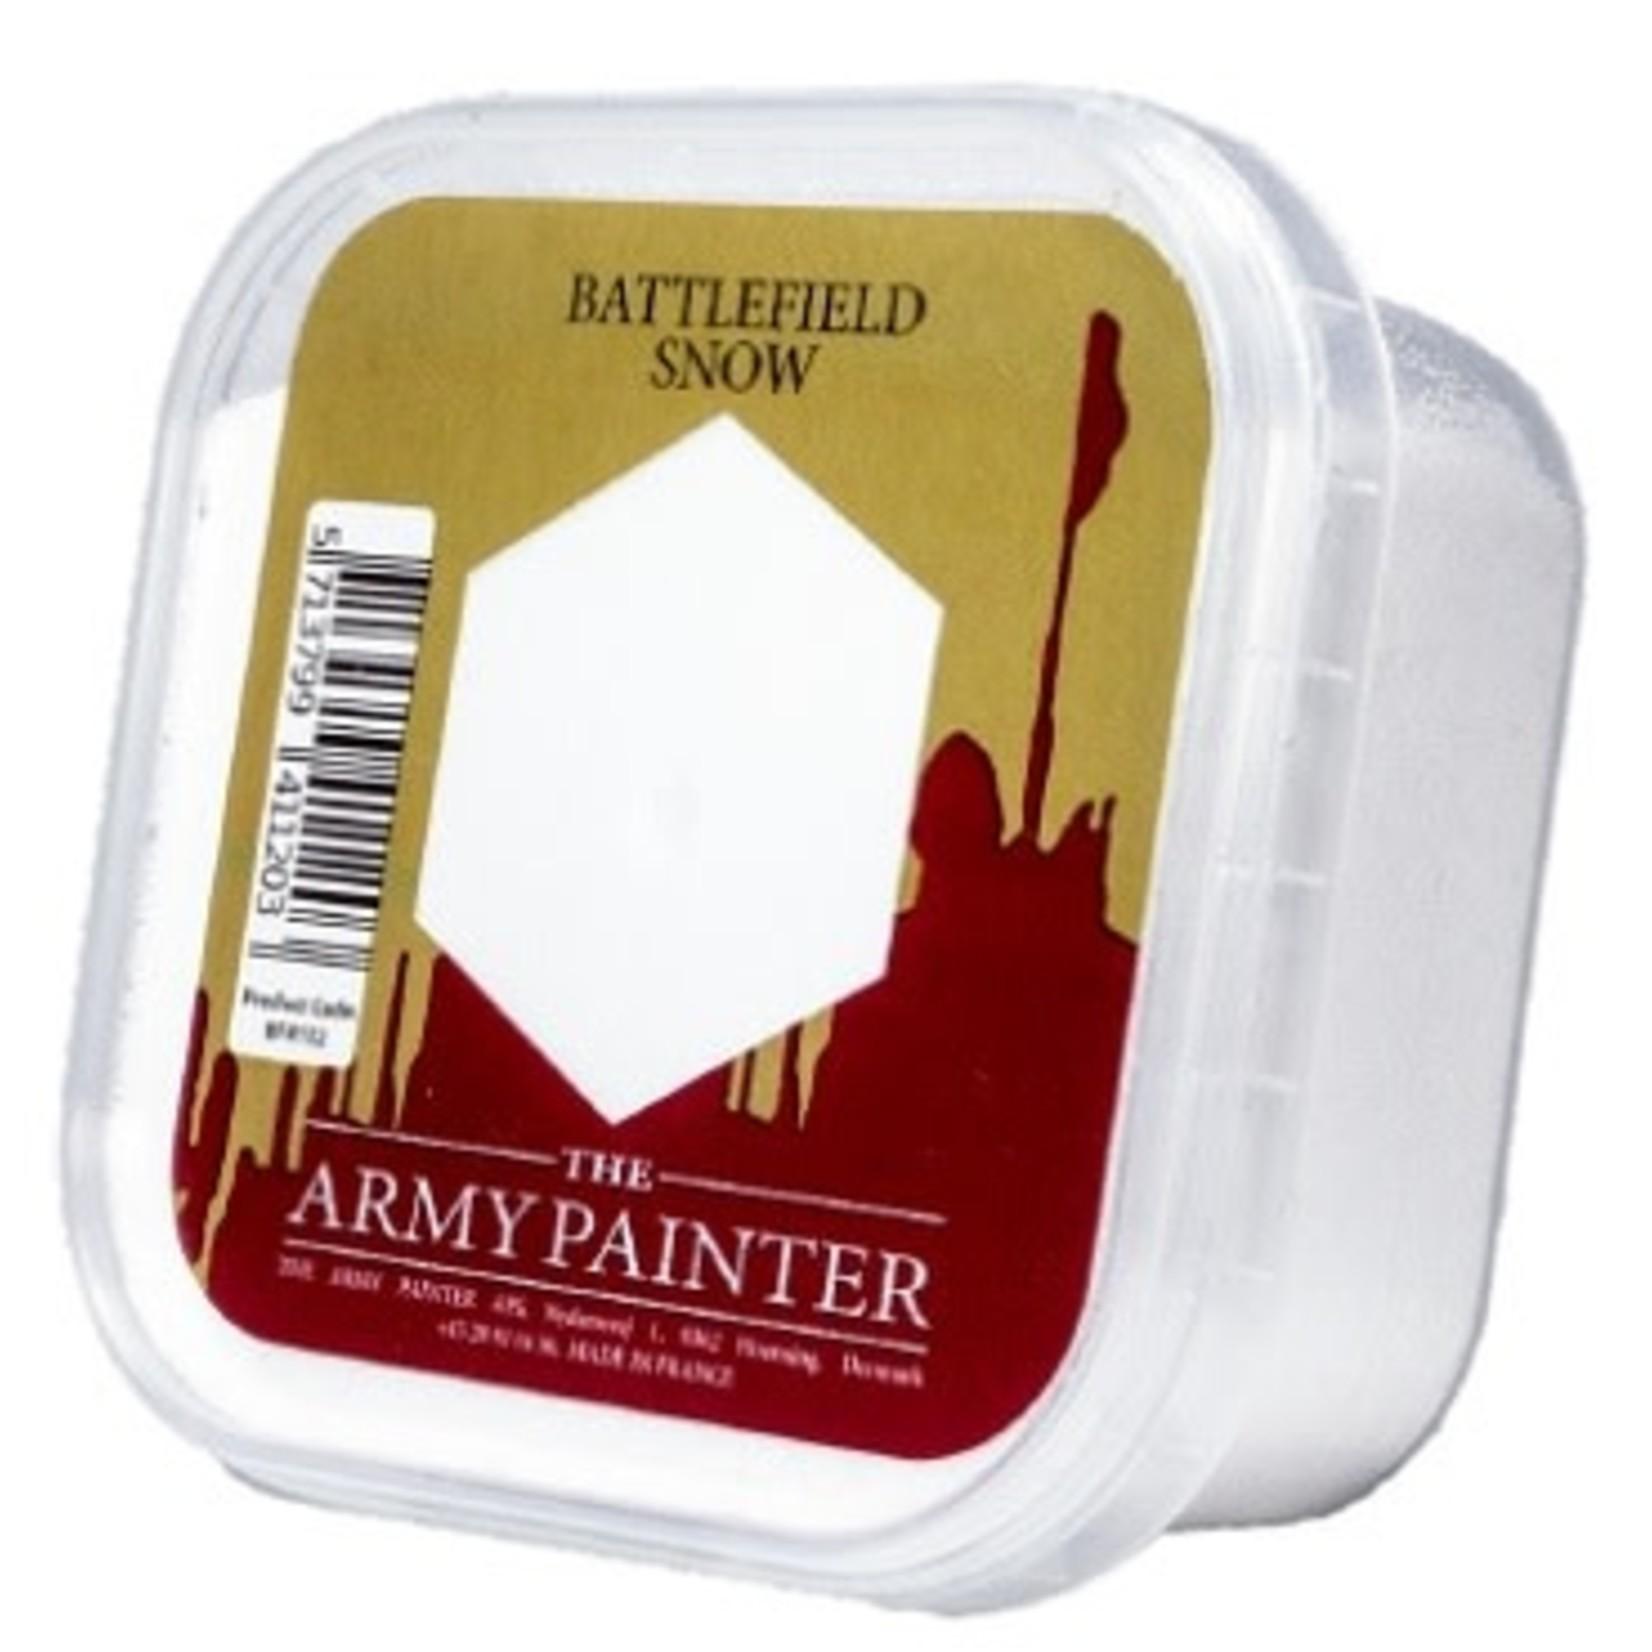 Army Painter Battlefields : Snow Flock